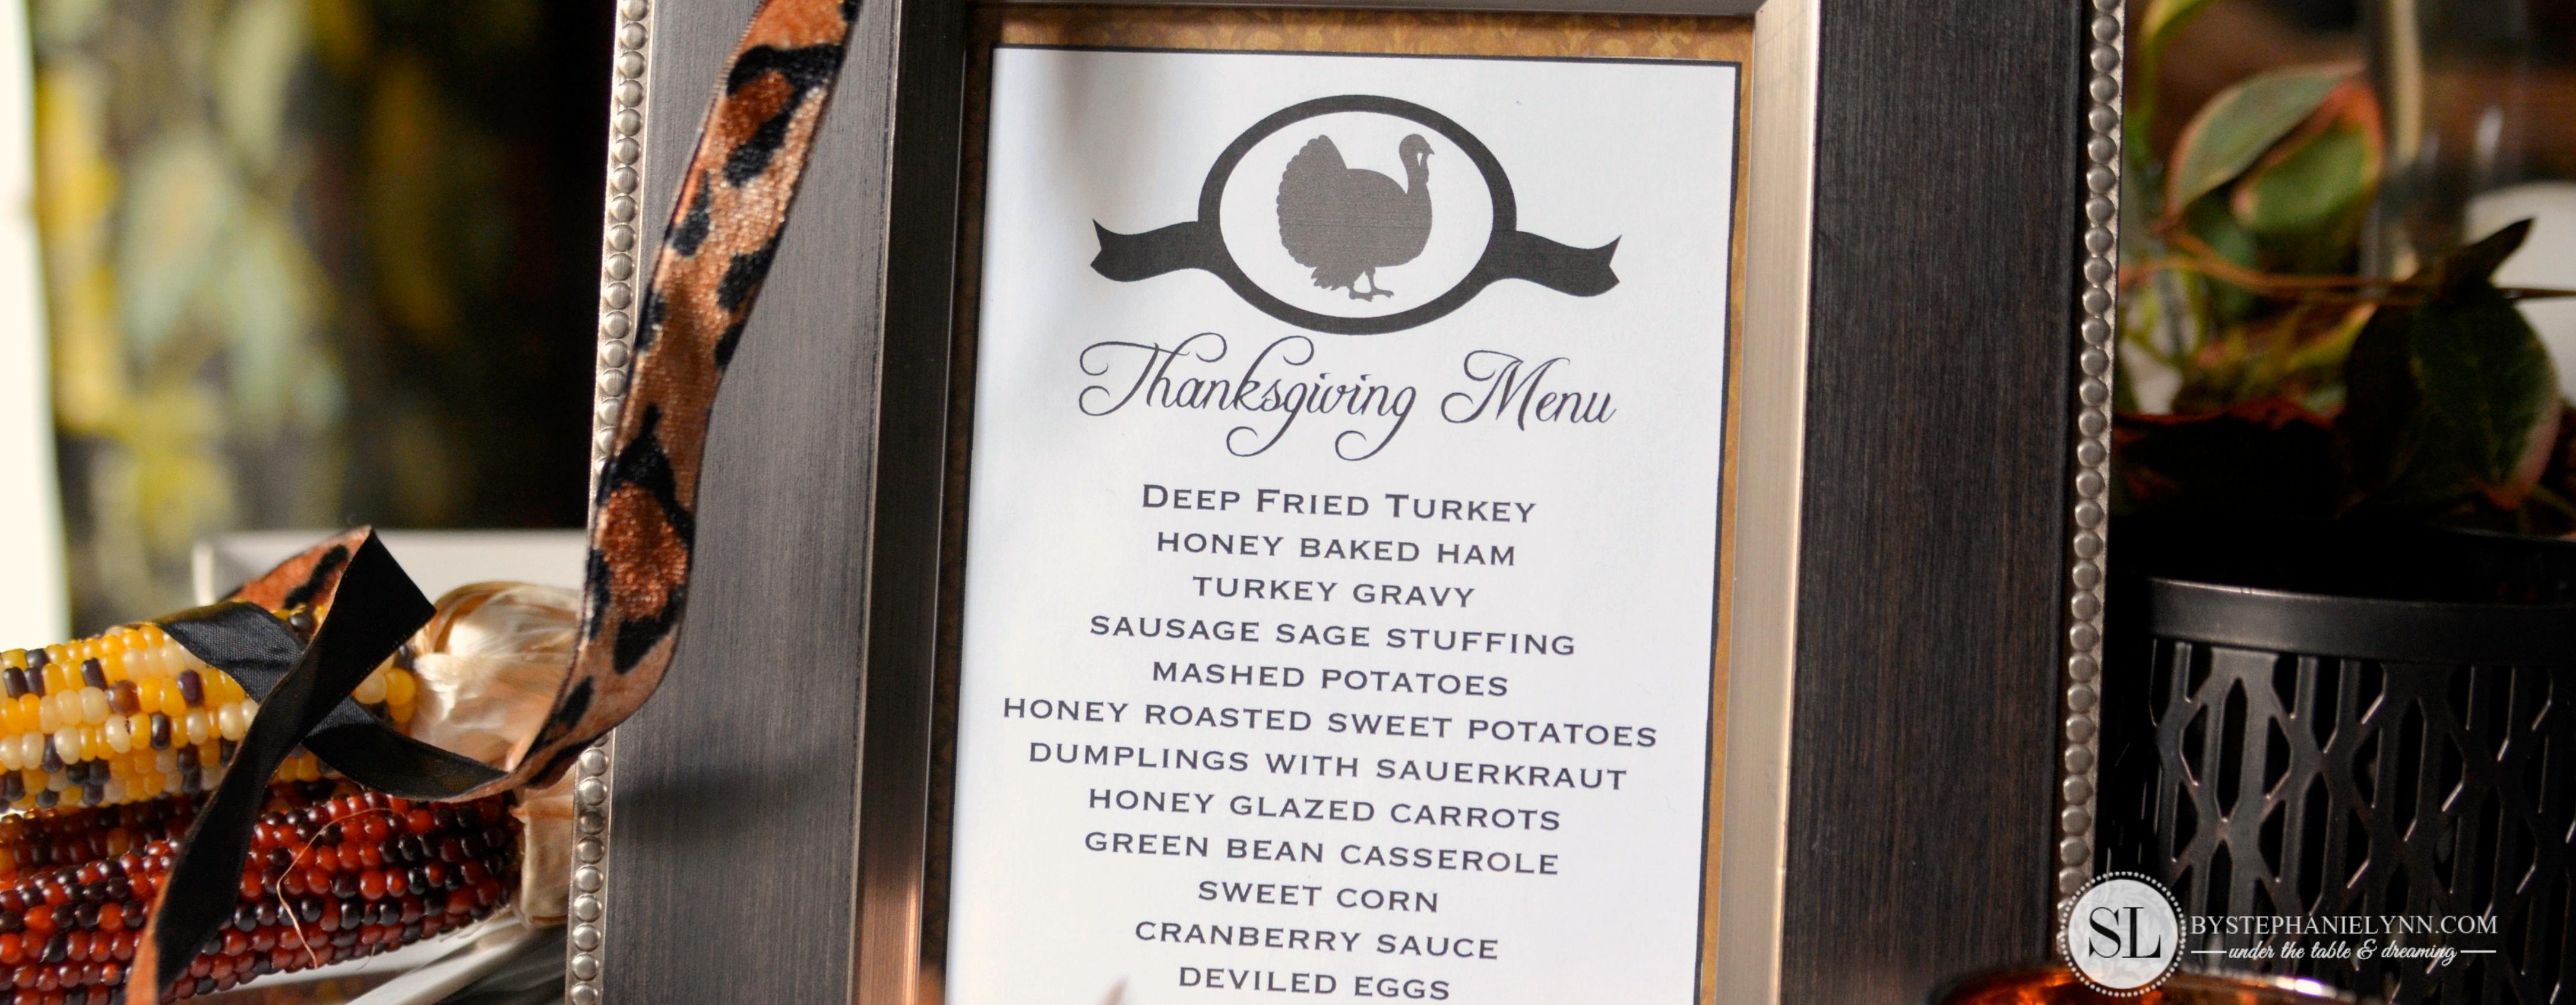 Printable Thanksgiving Menu Template   Making Printables With The - Free Printable Thanksgiving Menu Template